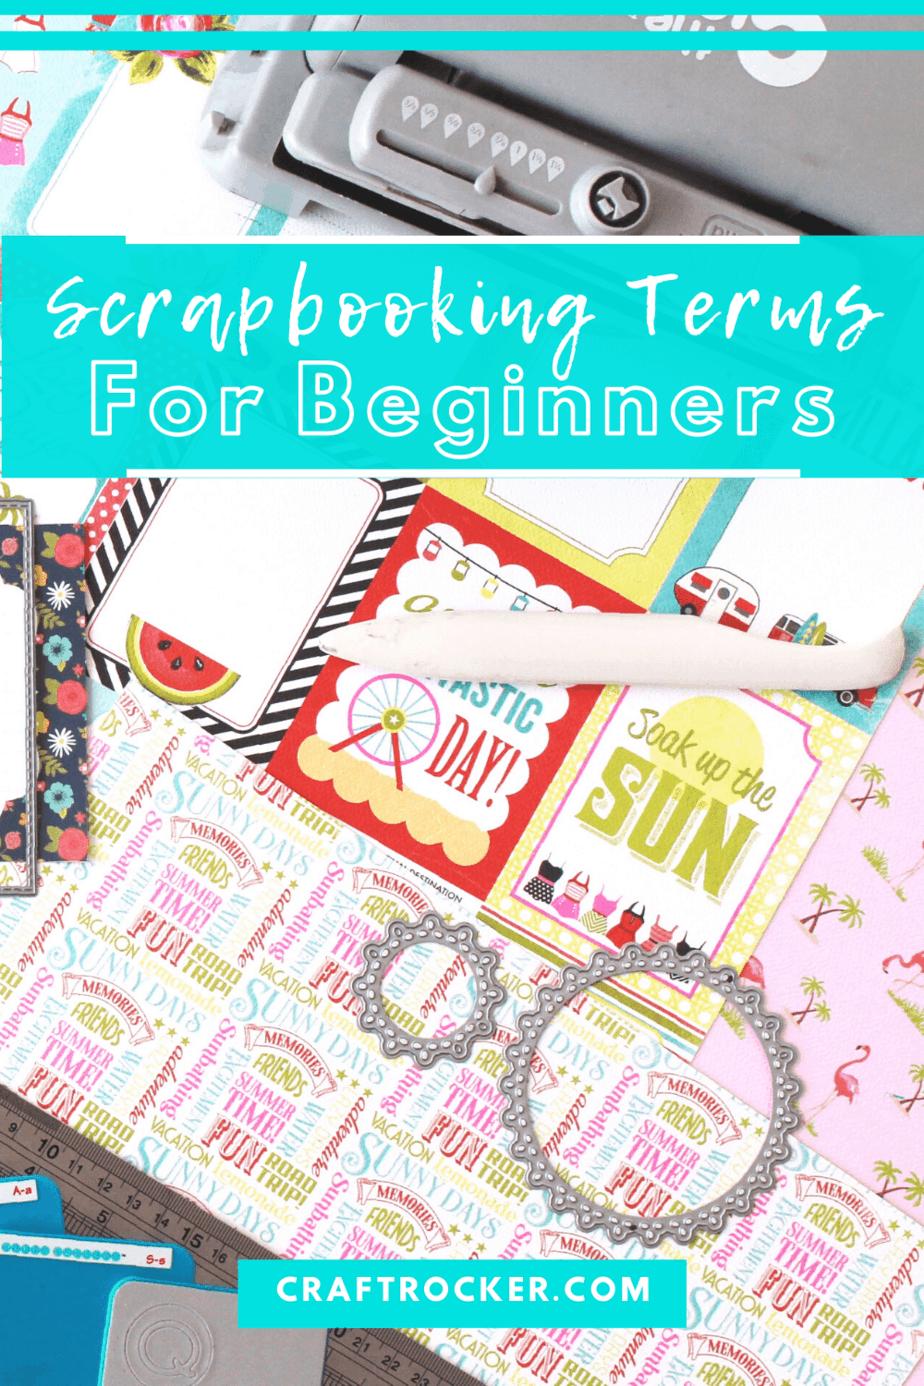 Scrapbook Supplies with text overlay - Scrapbooking Terms for Beginners - Craft Rocker